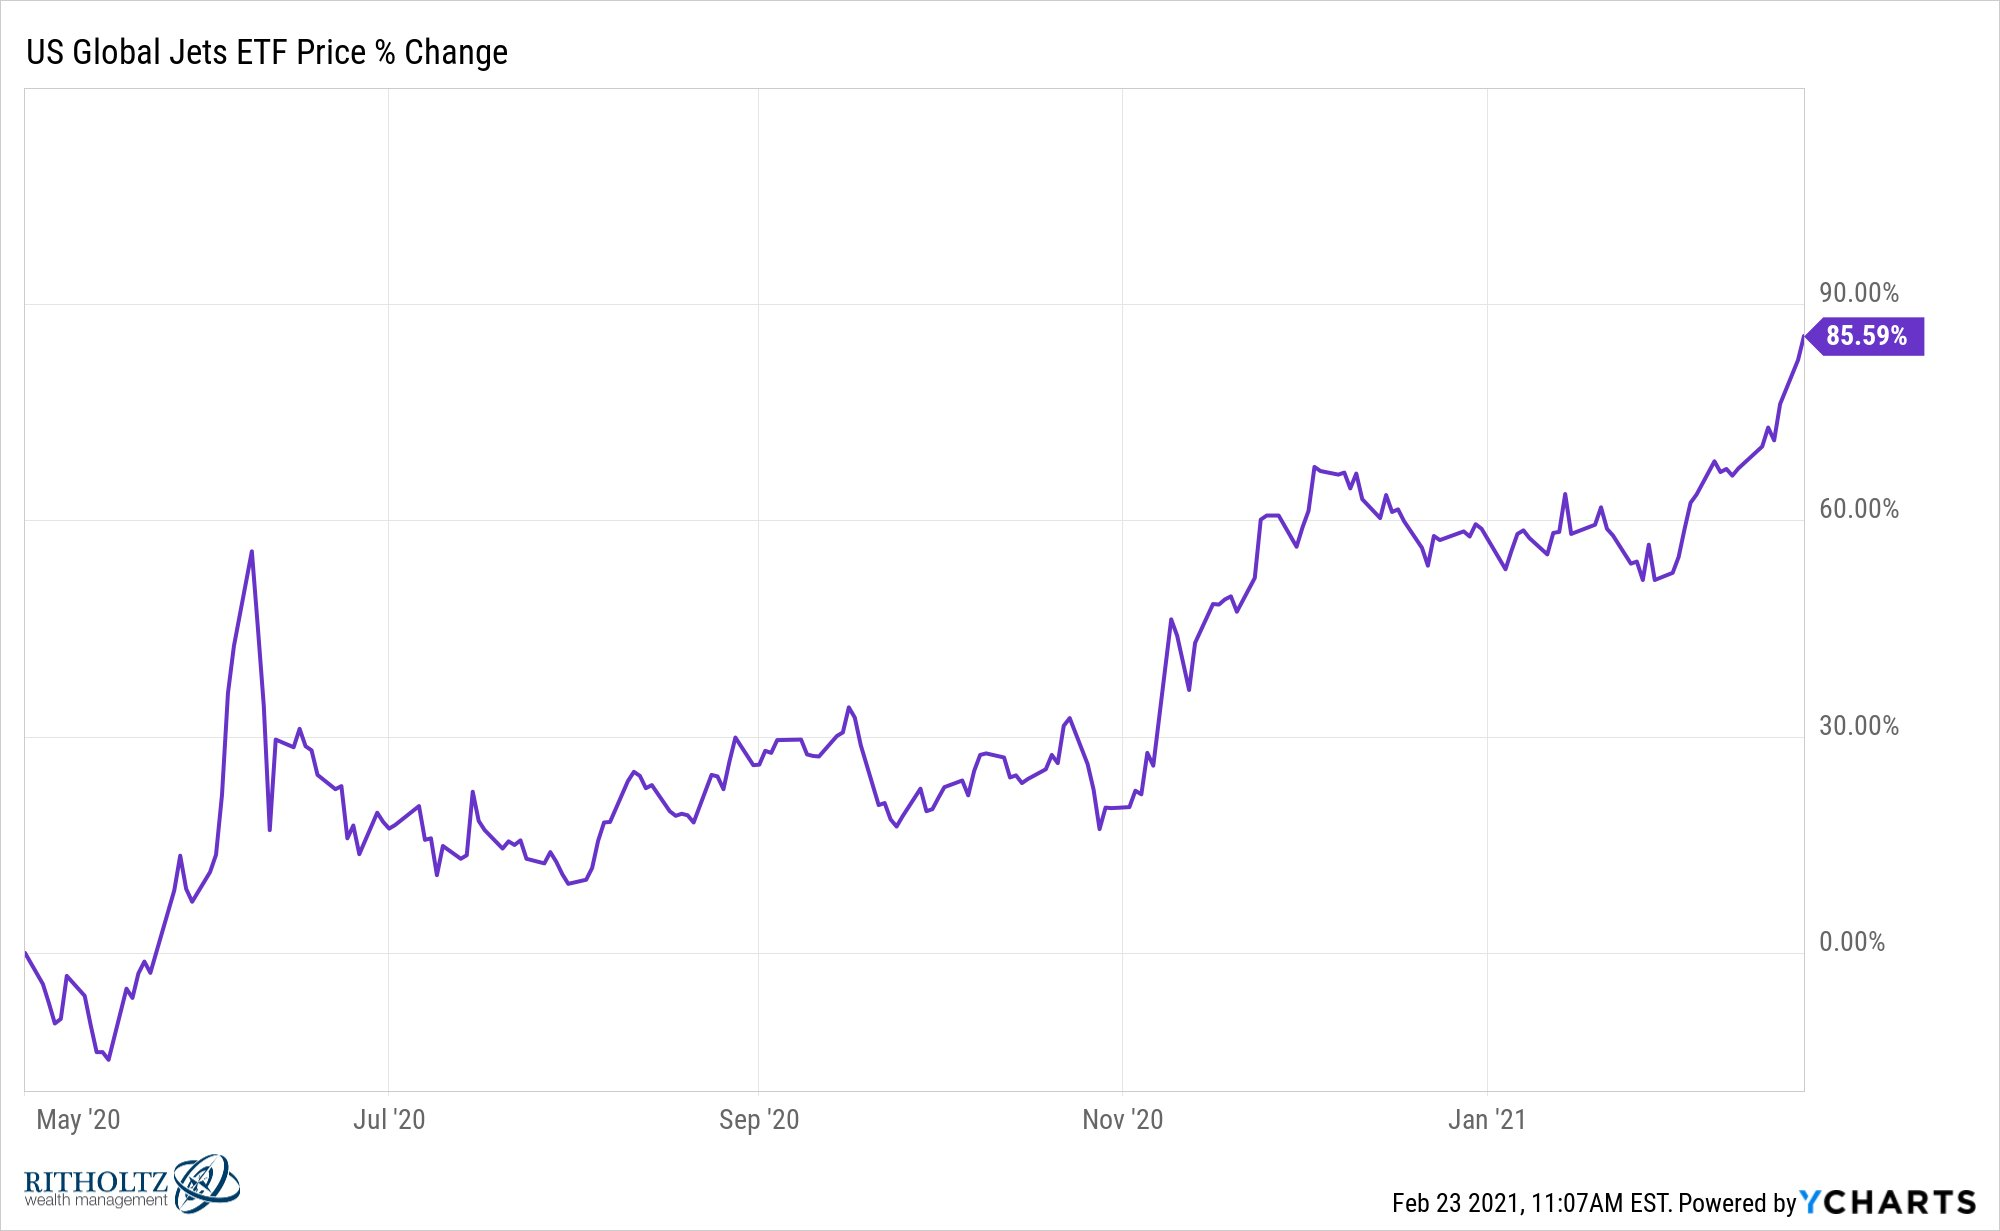 Jet ETF up 86% since Warren Buffett said he sold all his shares